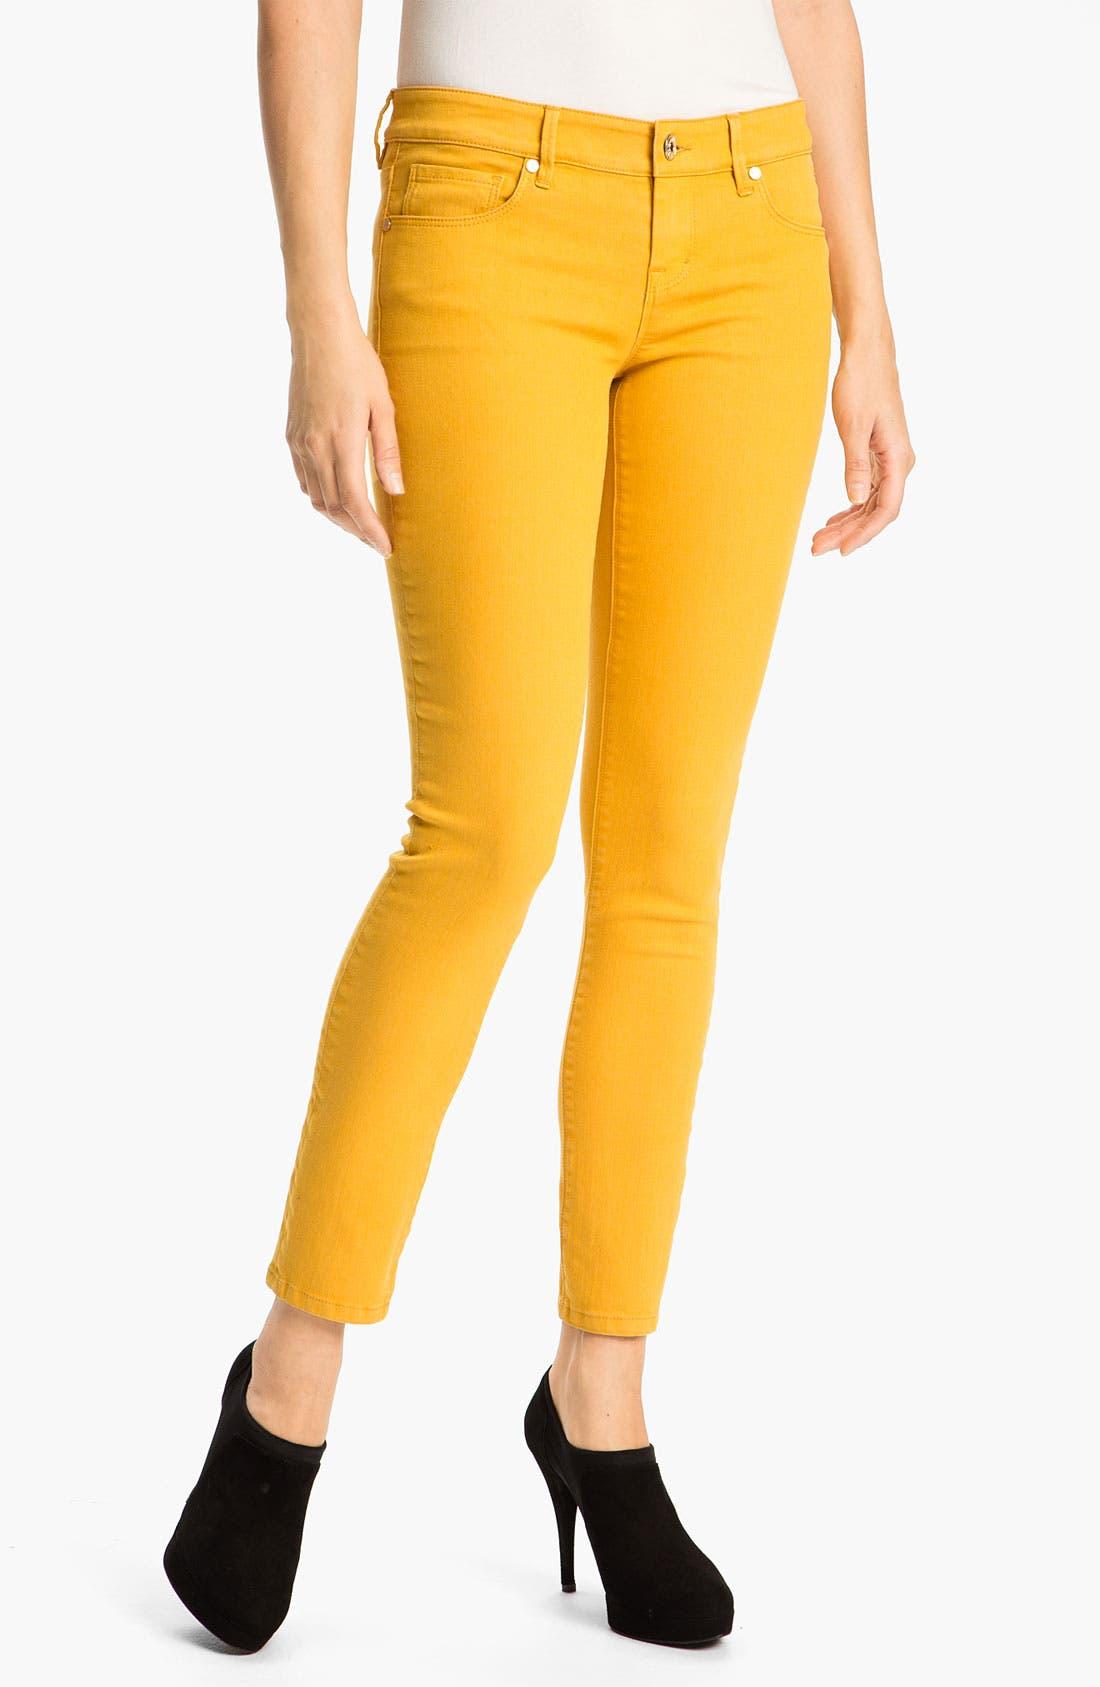 Main Image - Isaac Mizrahi Jeans 'Samantha' Colored Skinny Jeans